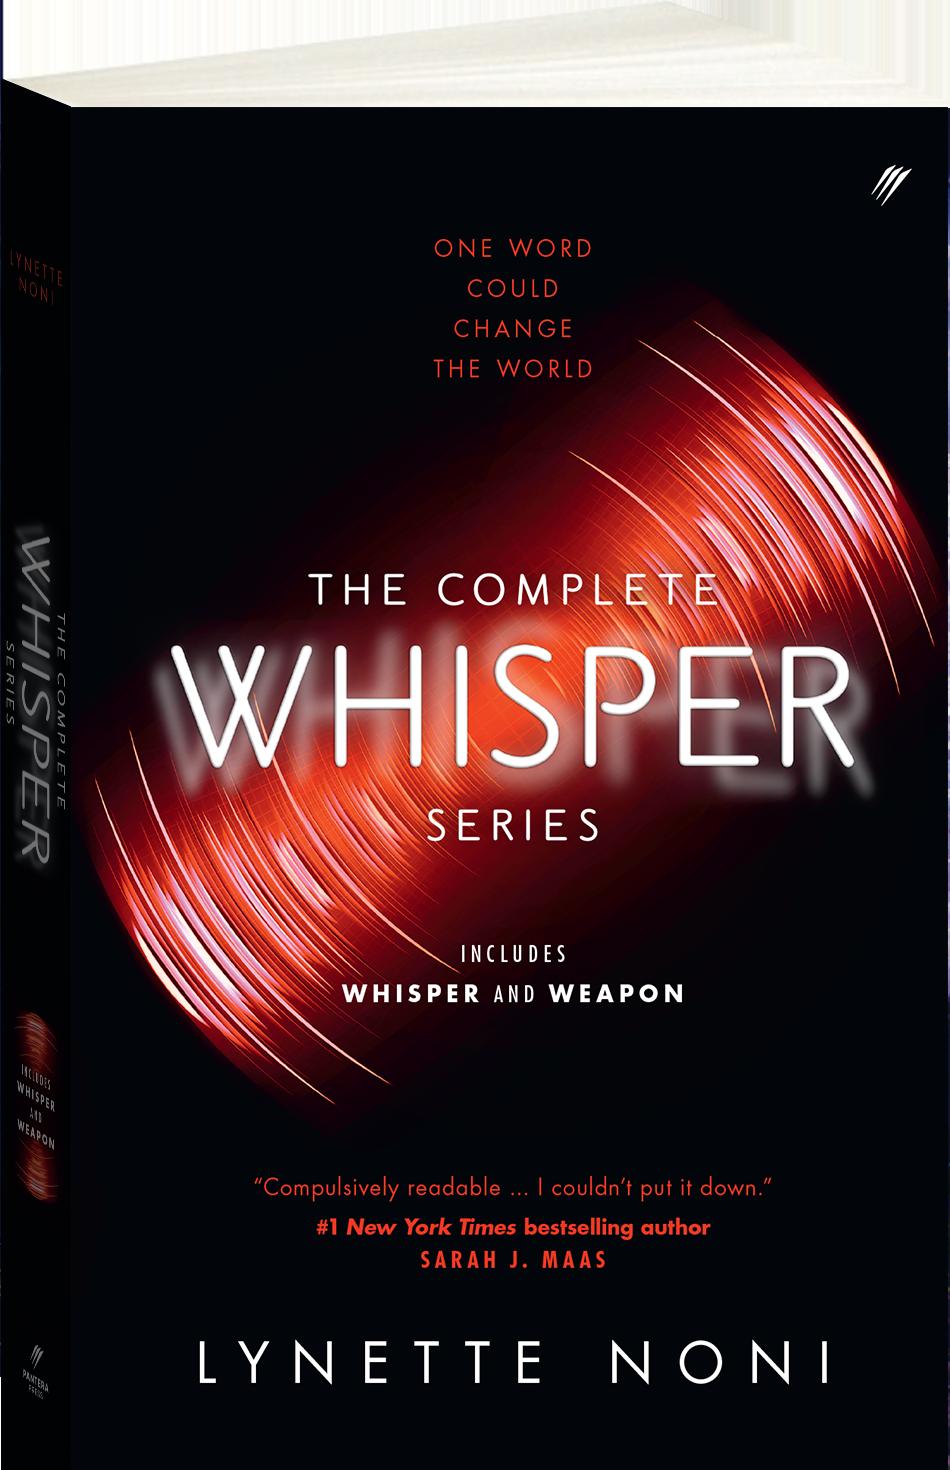 Whisper Series Cover Image